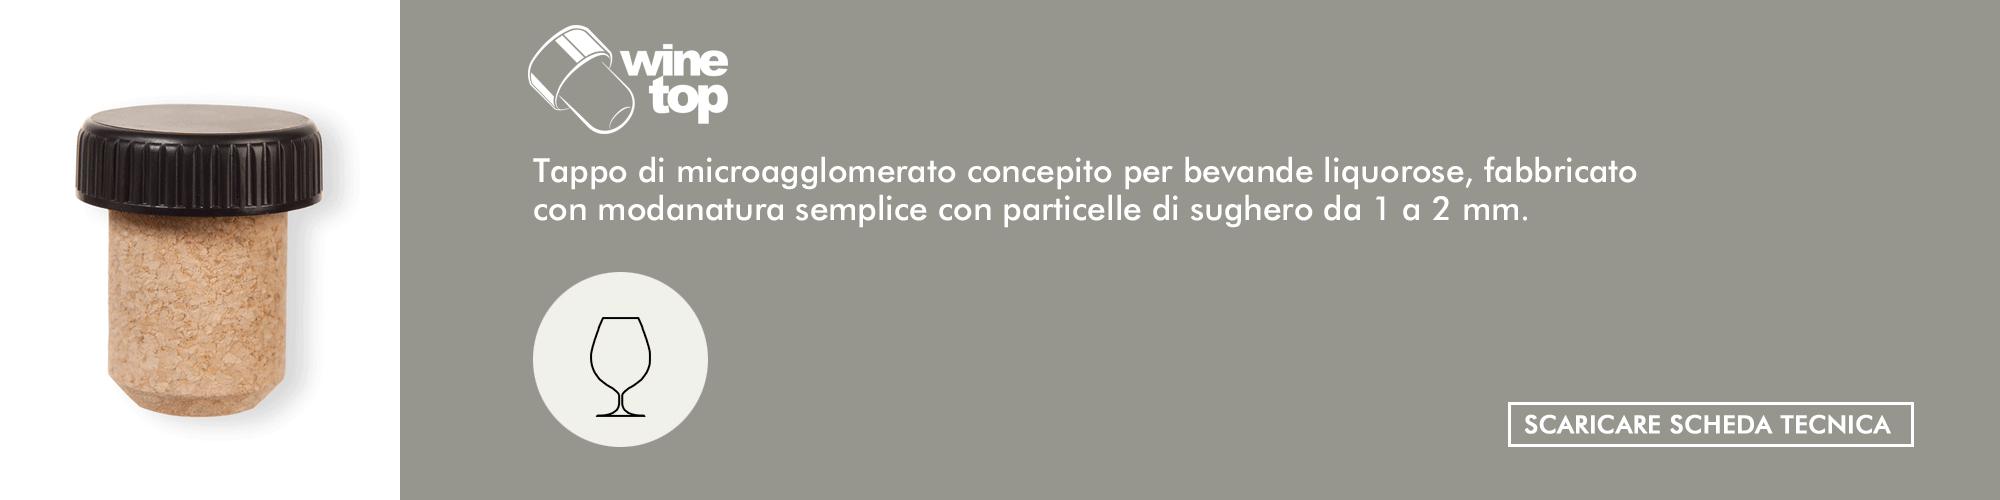 fitxa_winetop_ita.png